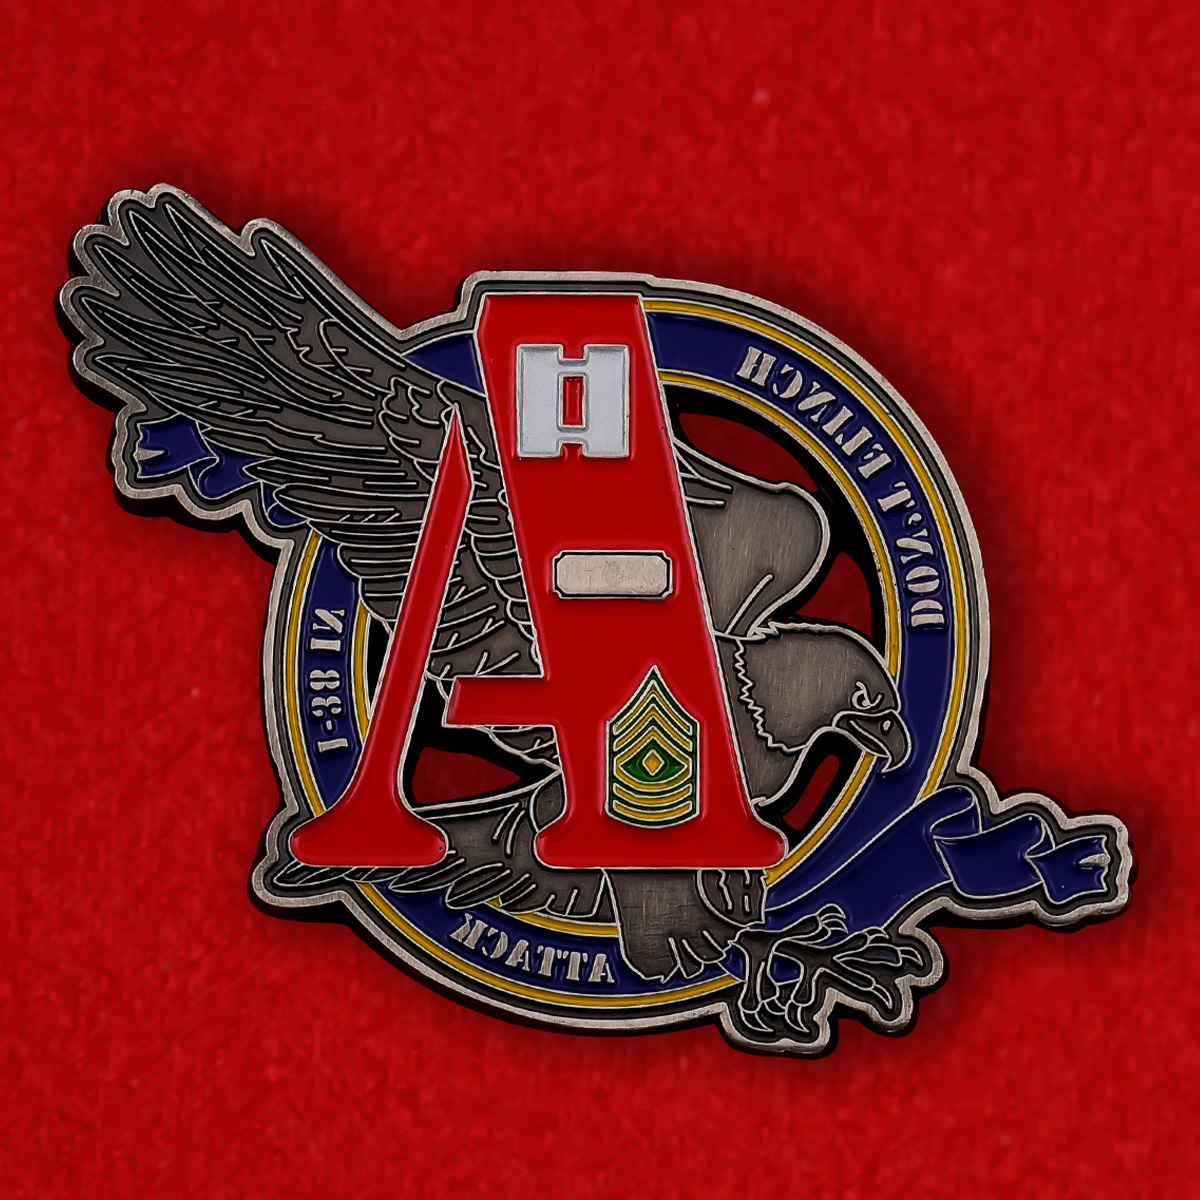 Челлендж коин 1-го батальона 38-го пехотного полка армии США